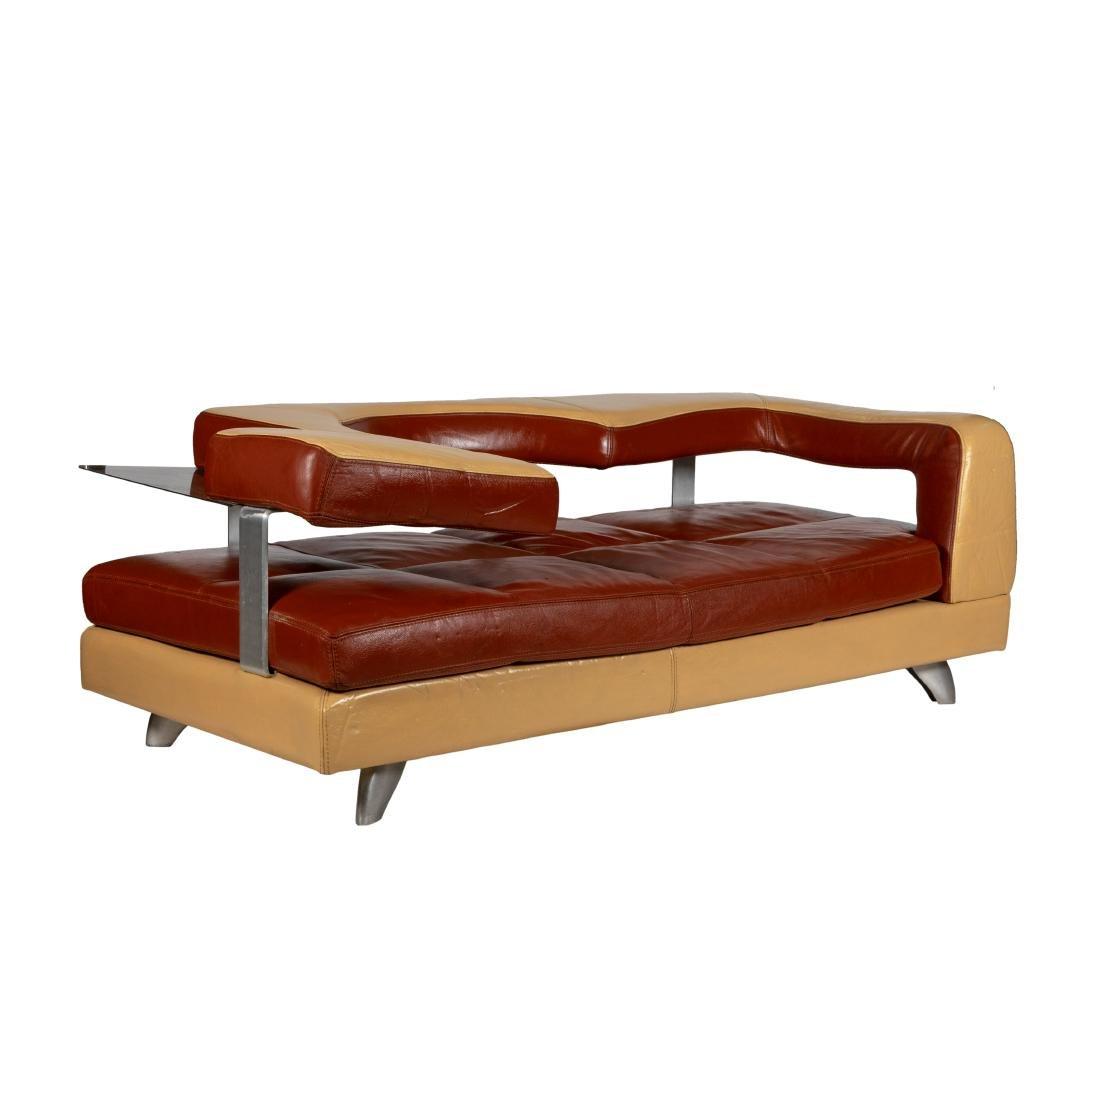 Interni - Leather Modern Sofa